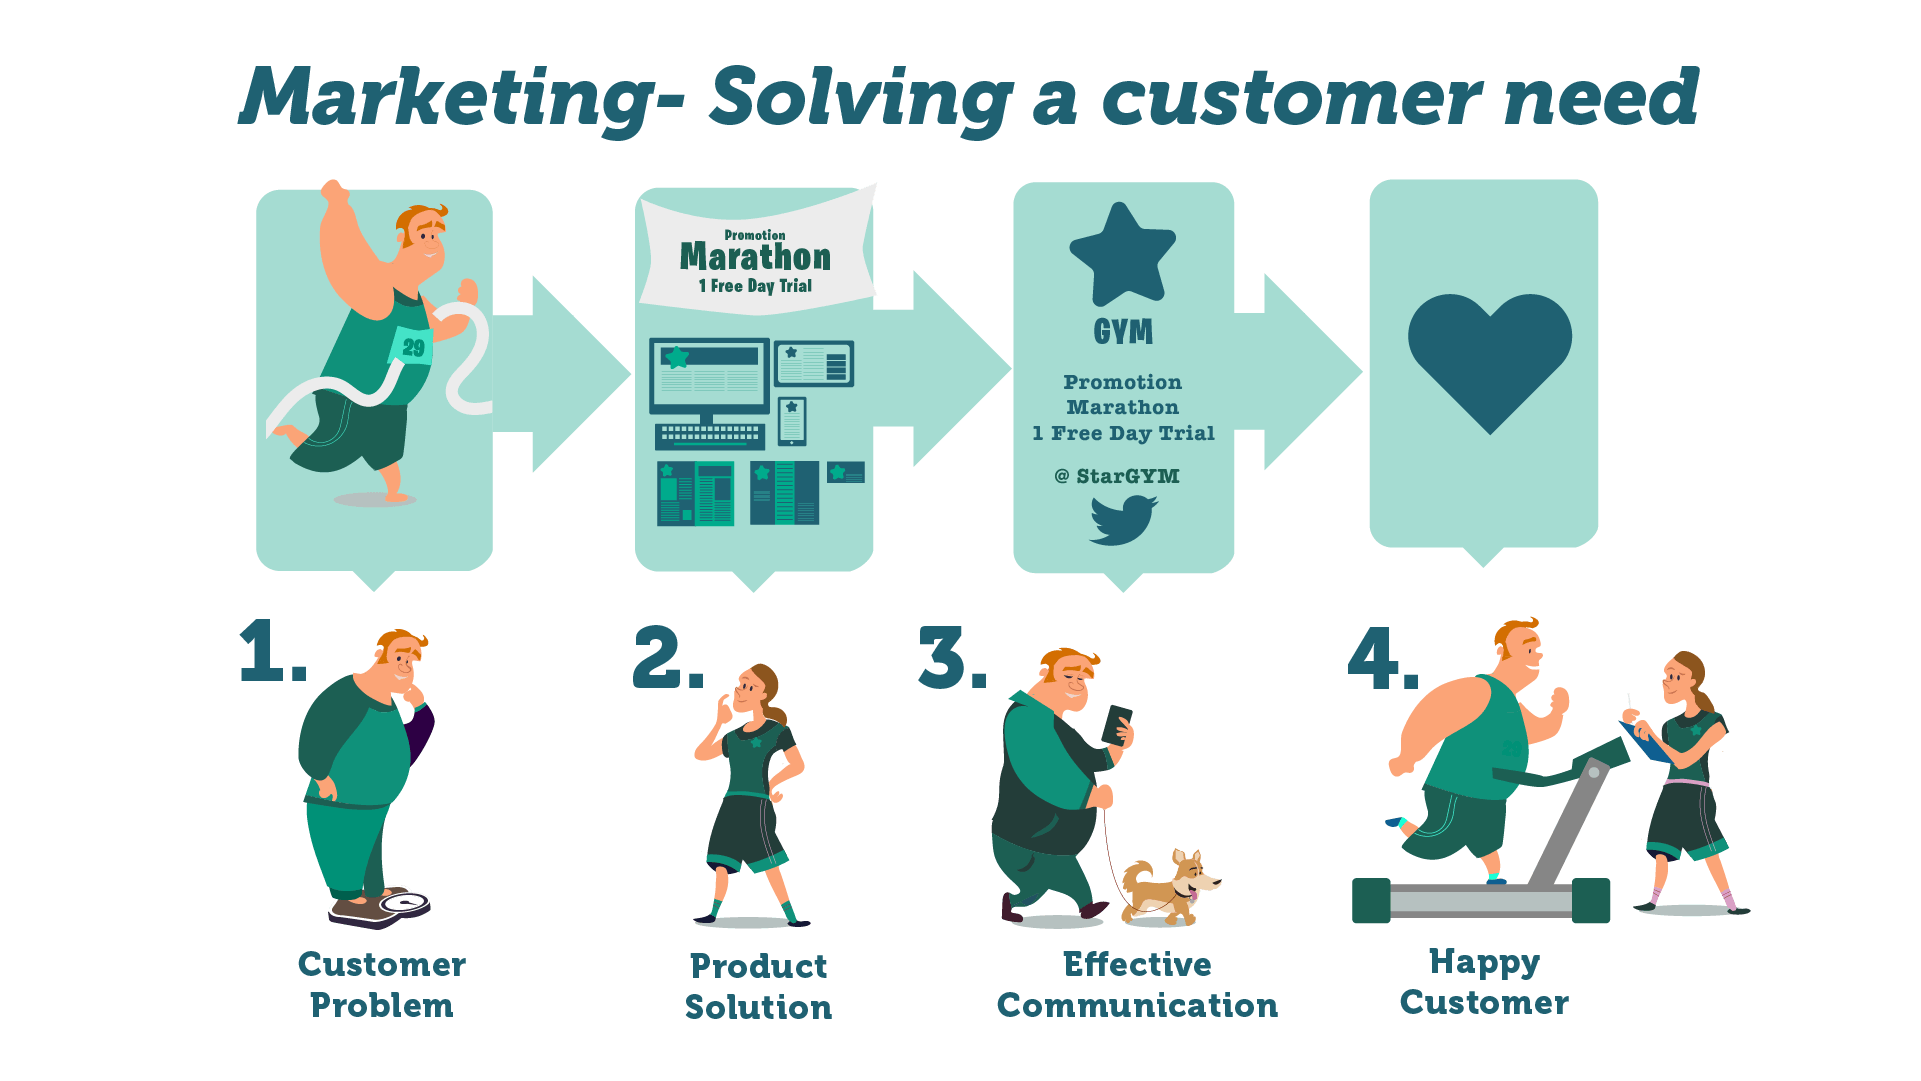 Solving a Customer need